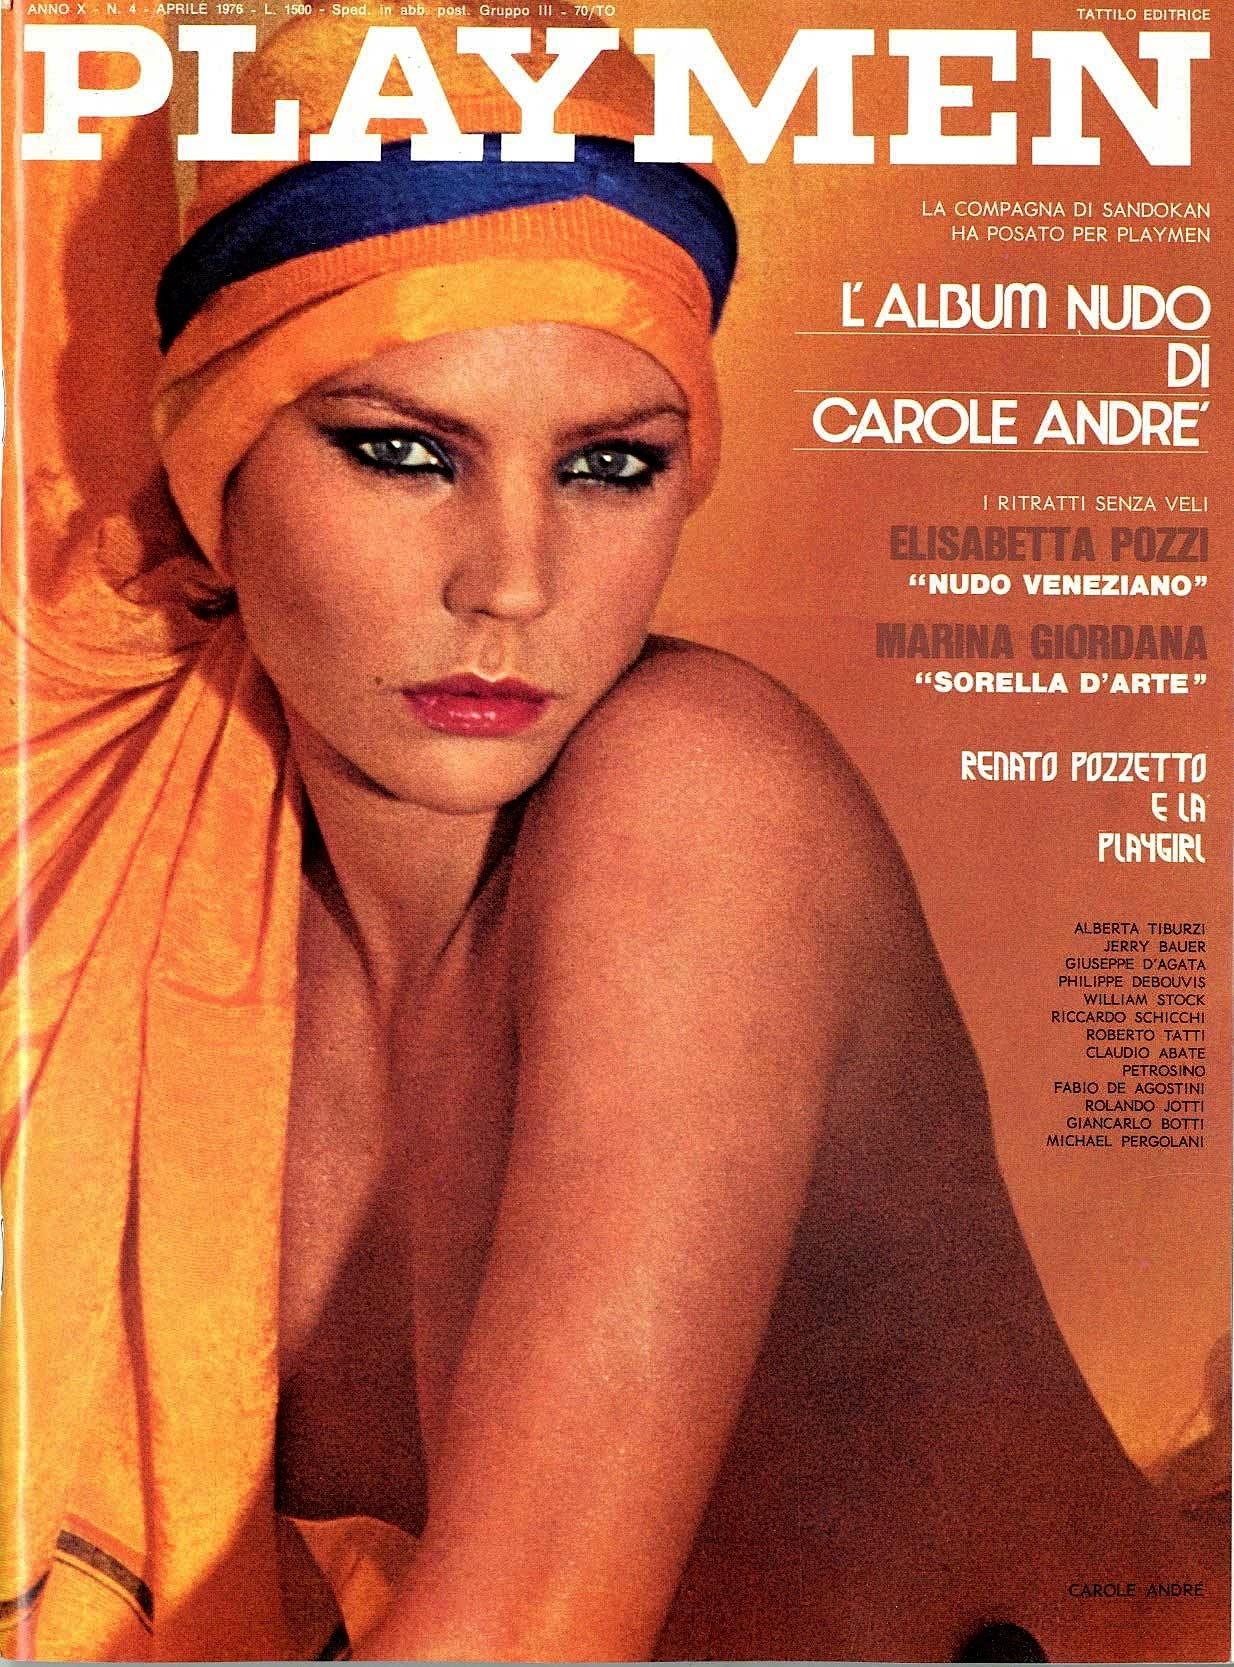 PLAYMEN-1976-carol_andré